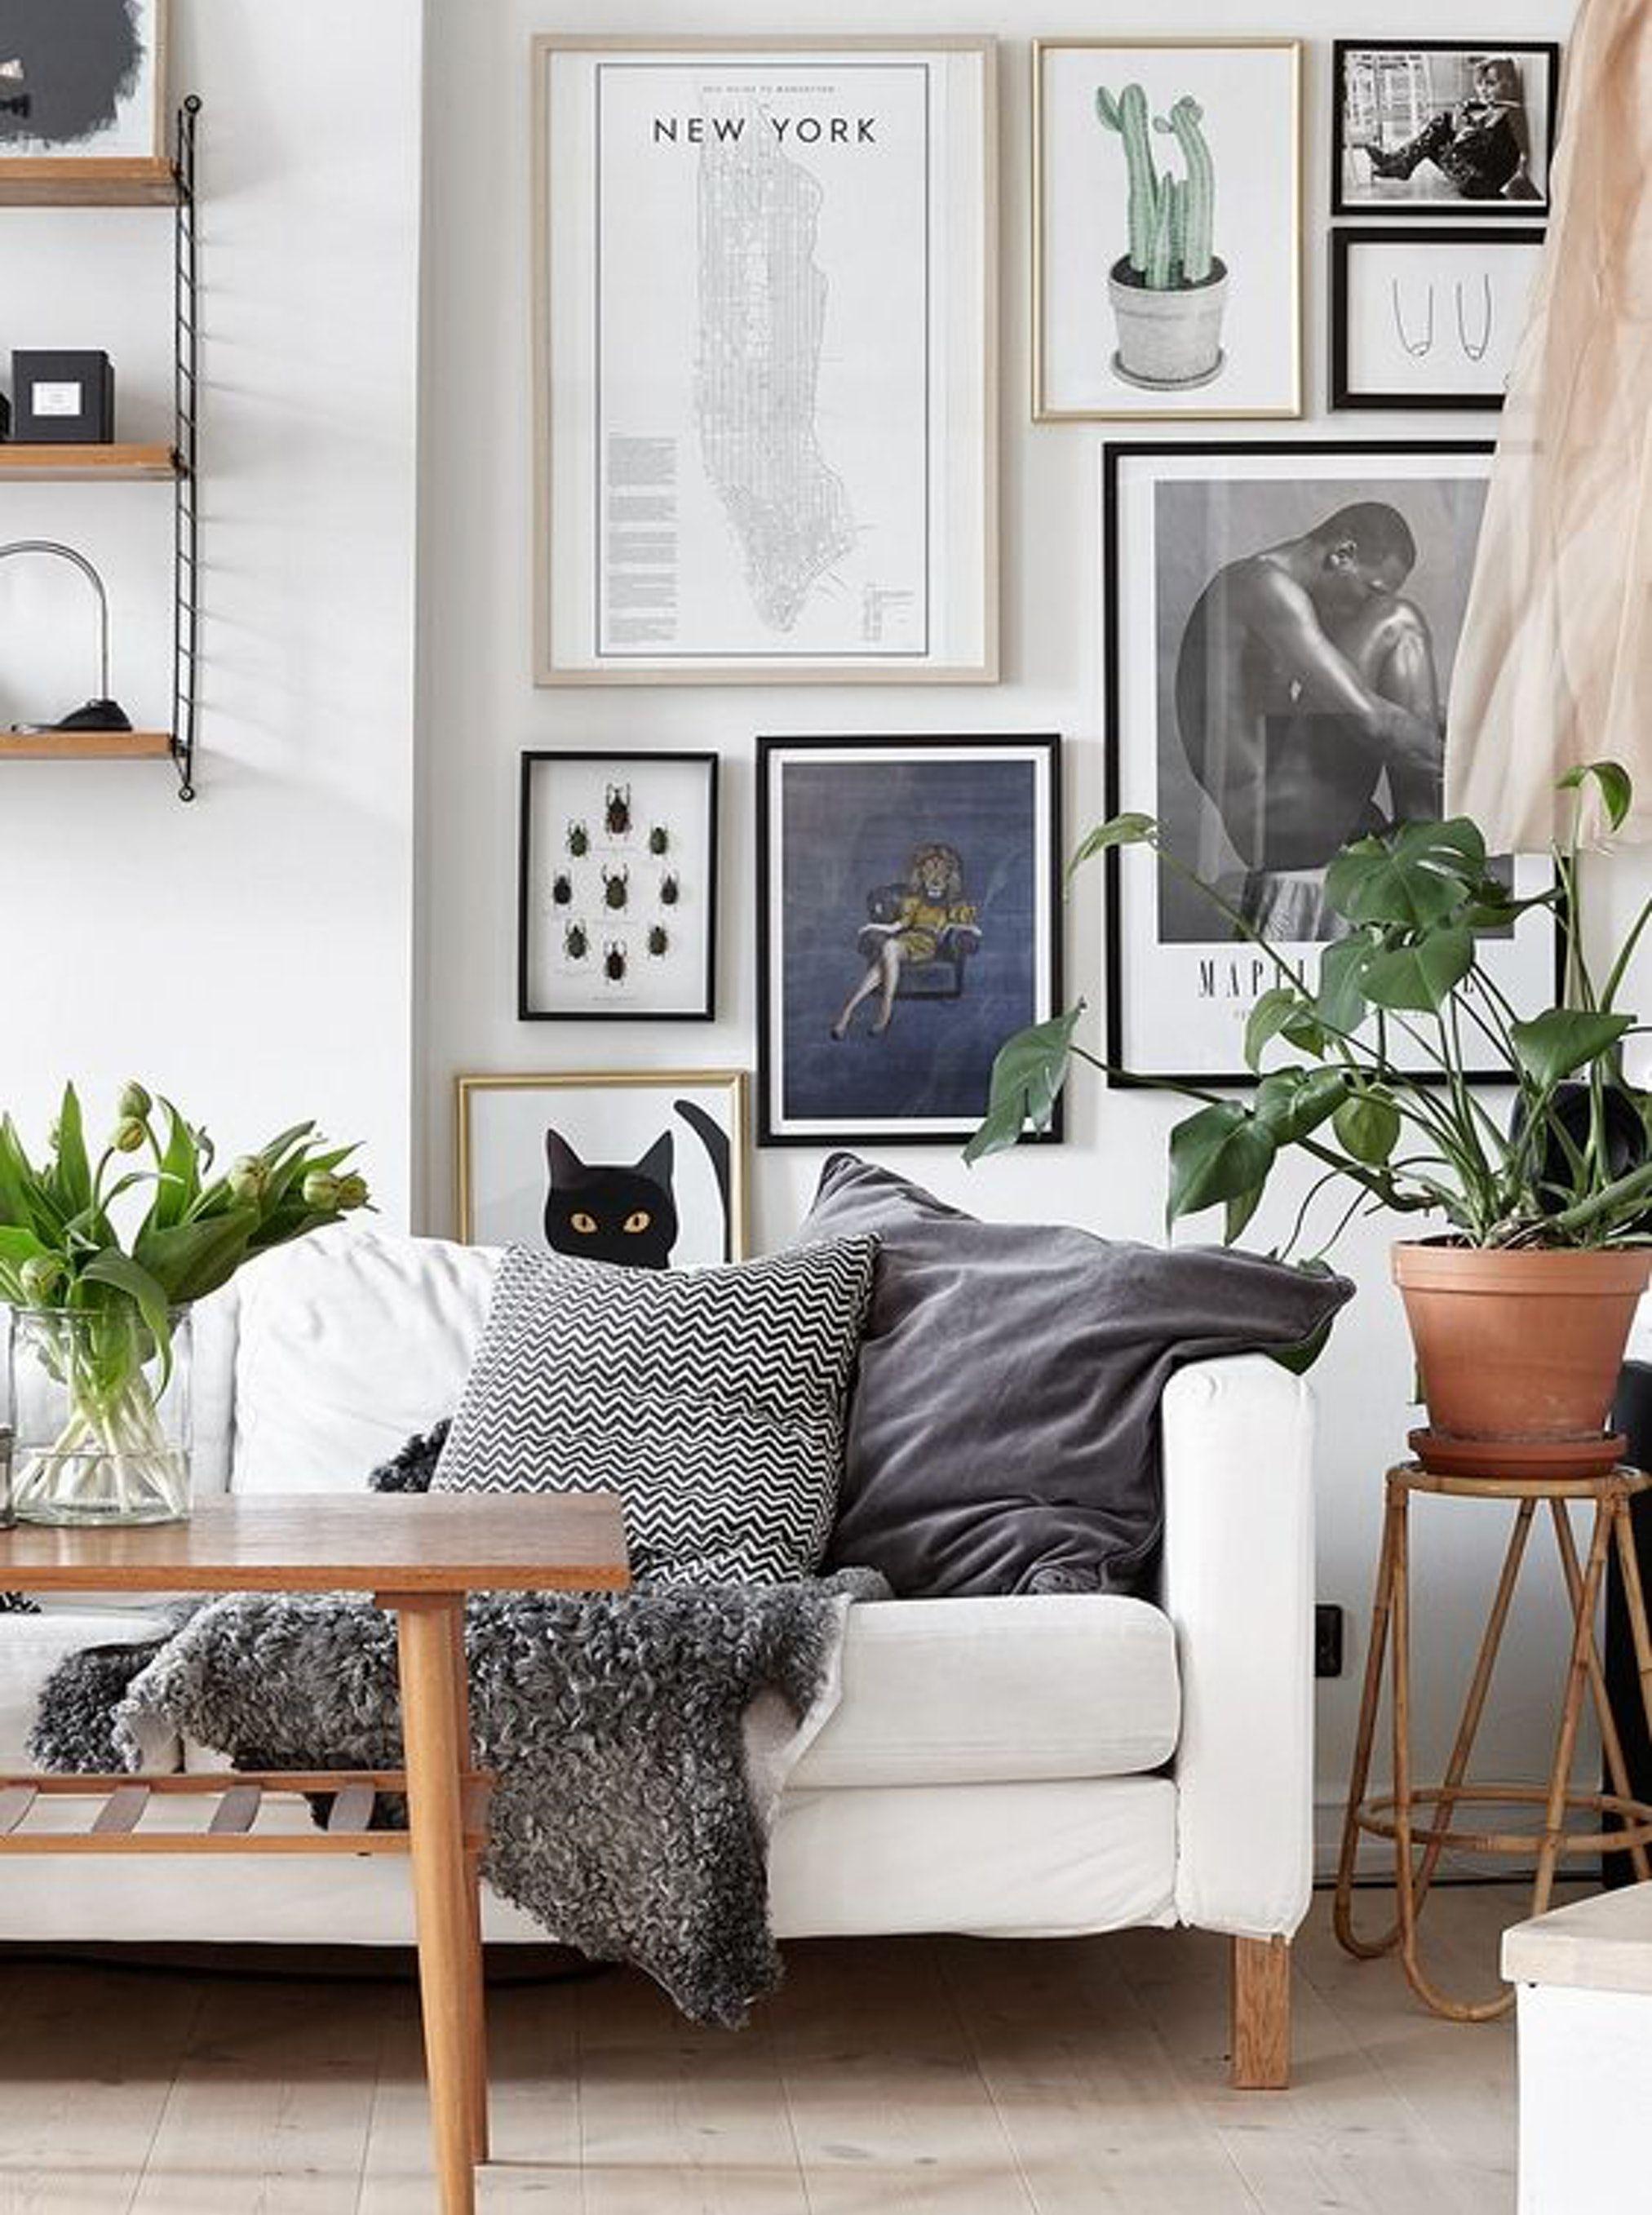 Beau Interior Design Style Quiz   Whatu0027s Your Decorating Style